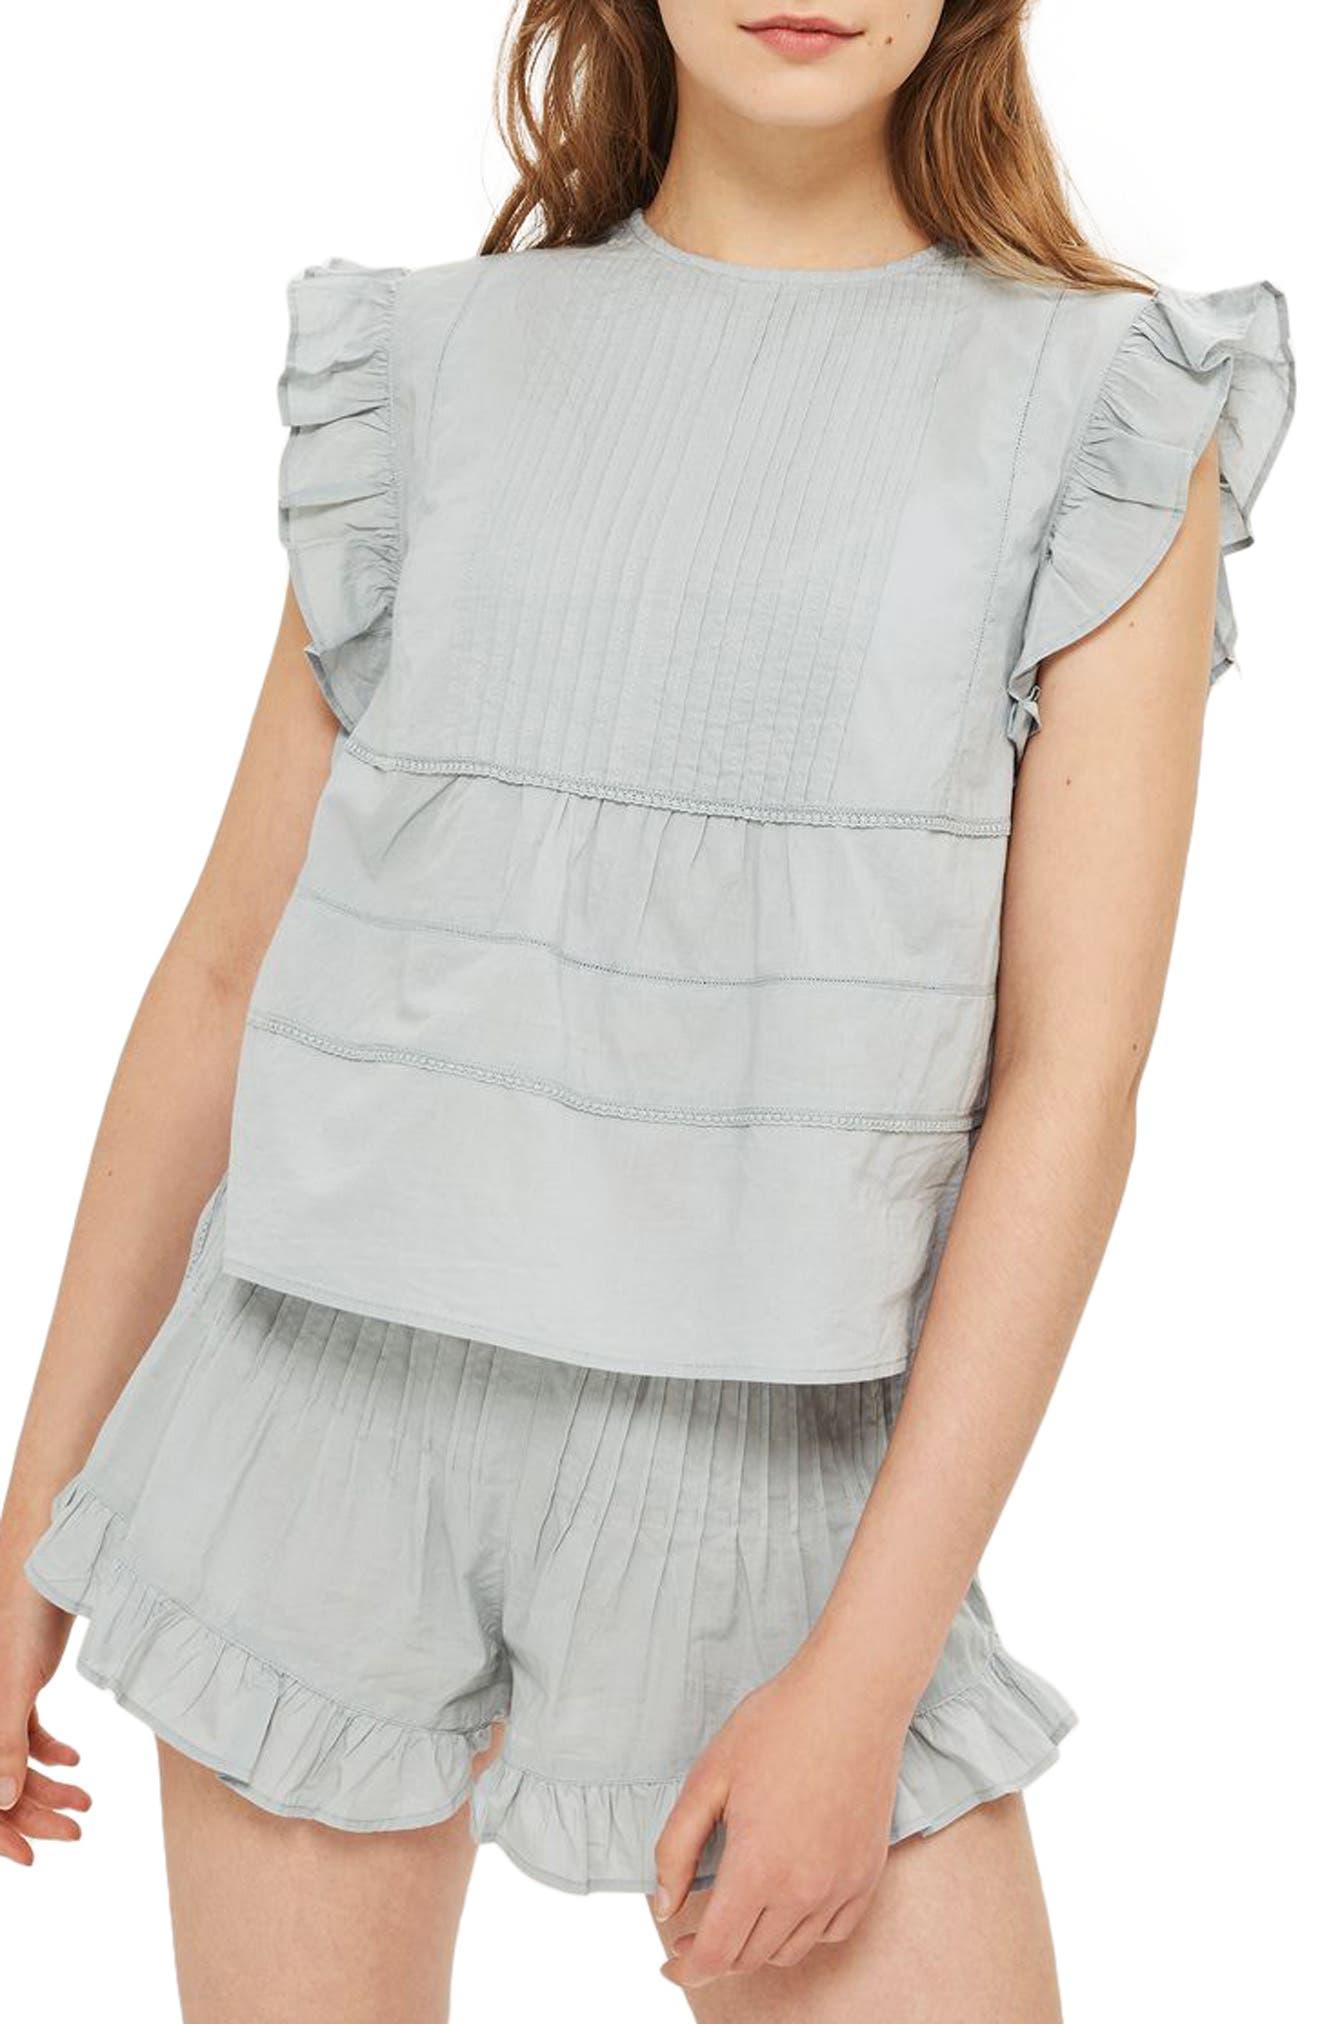 Topshop Bella Frilly Pajamas